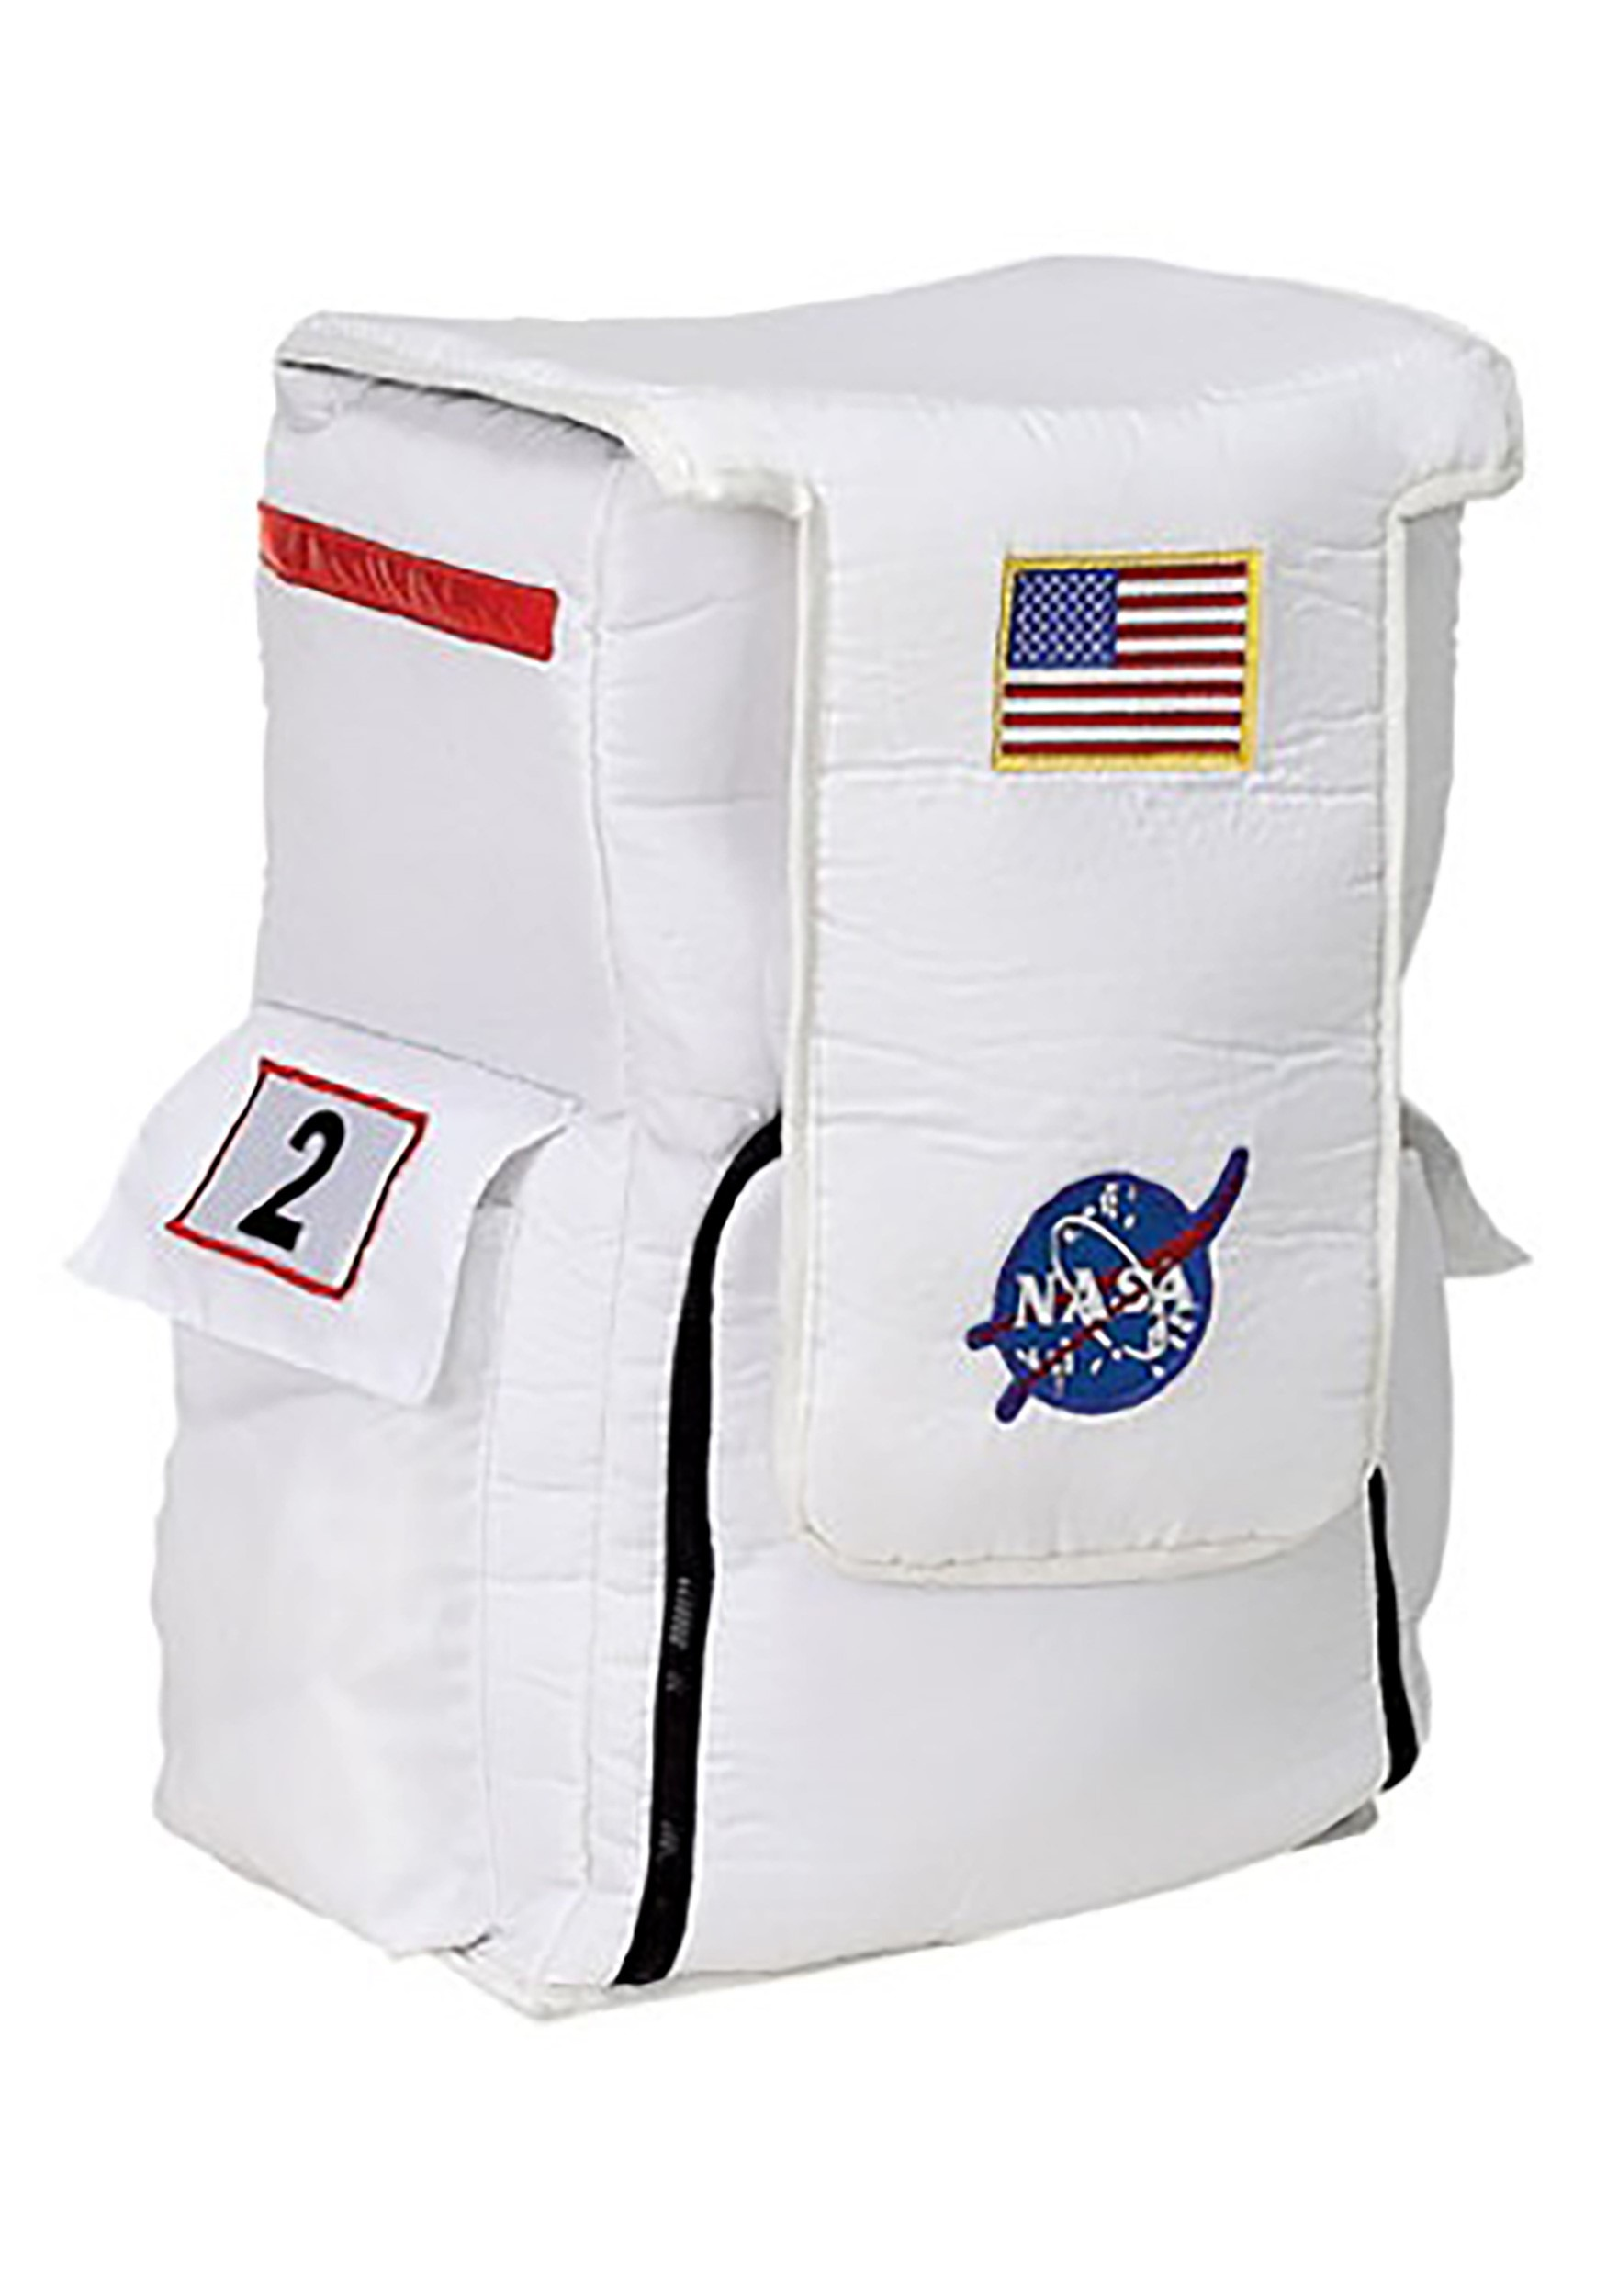 Kids Astronaut Backpack